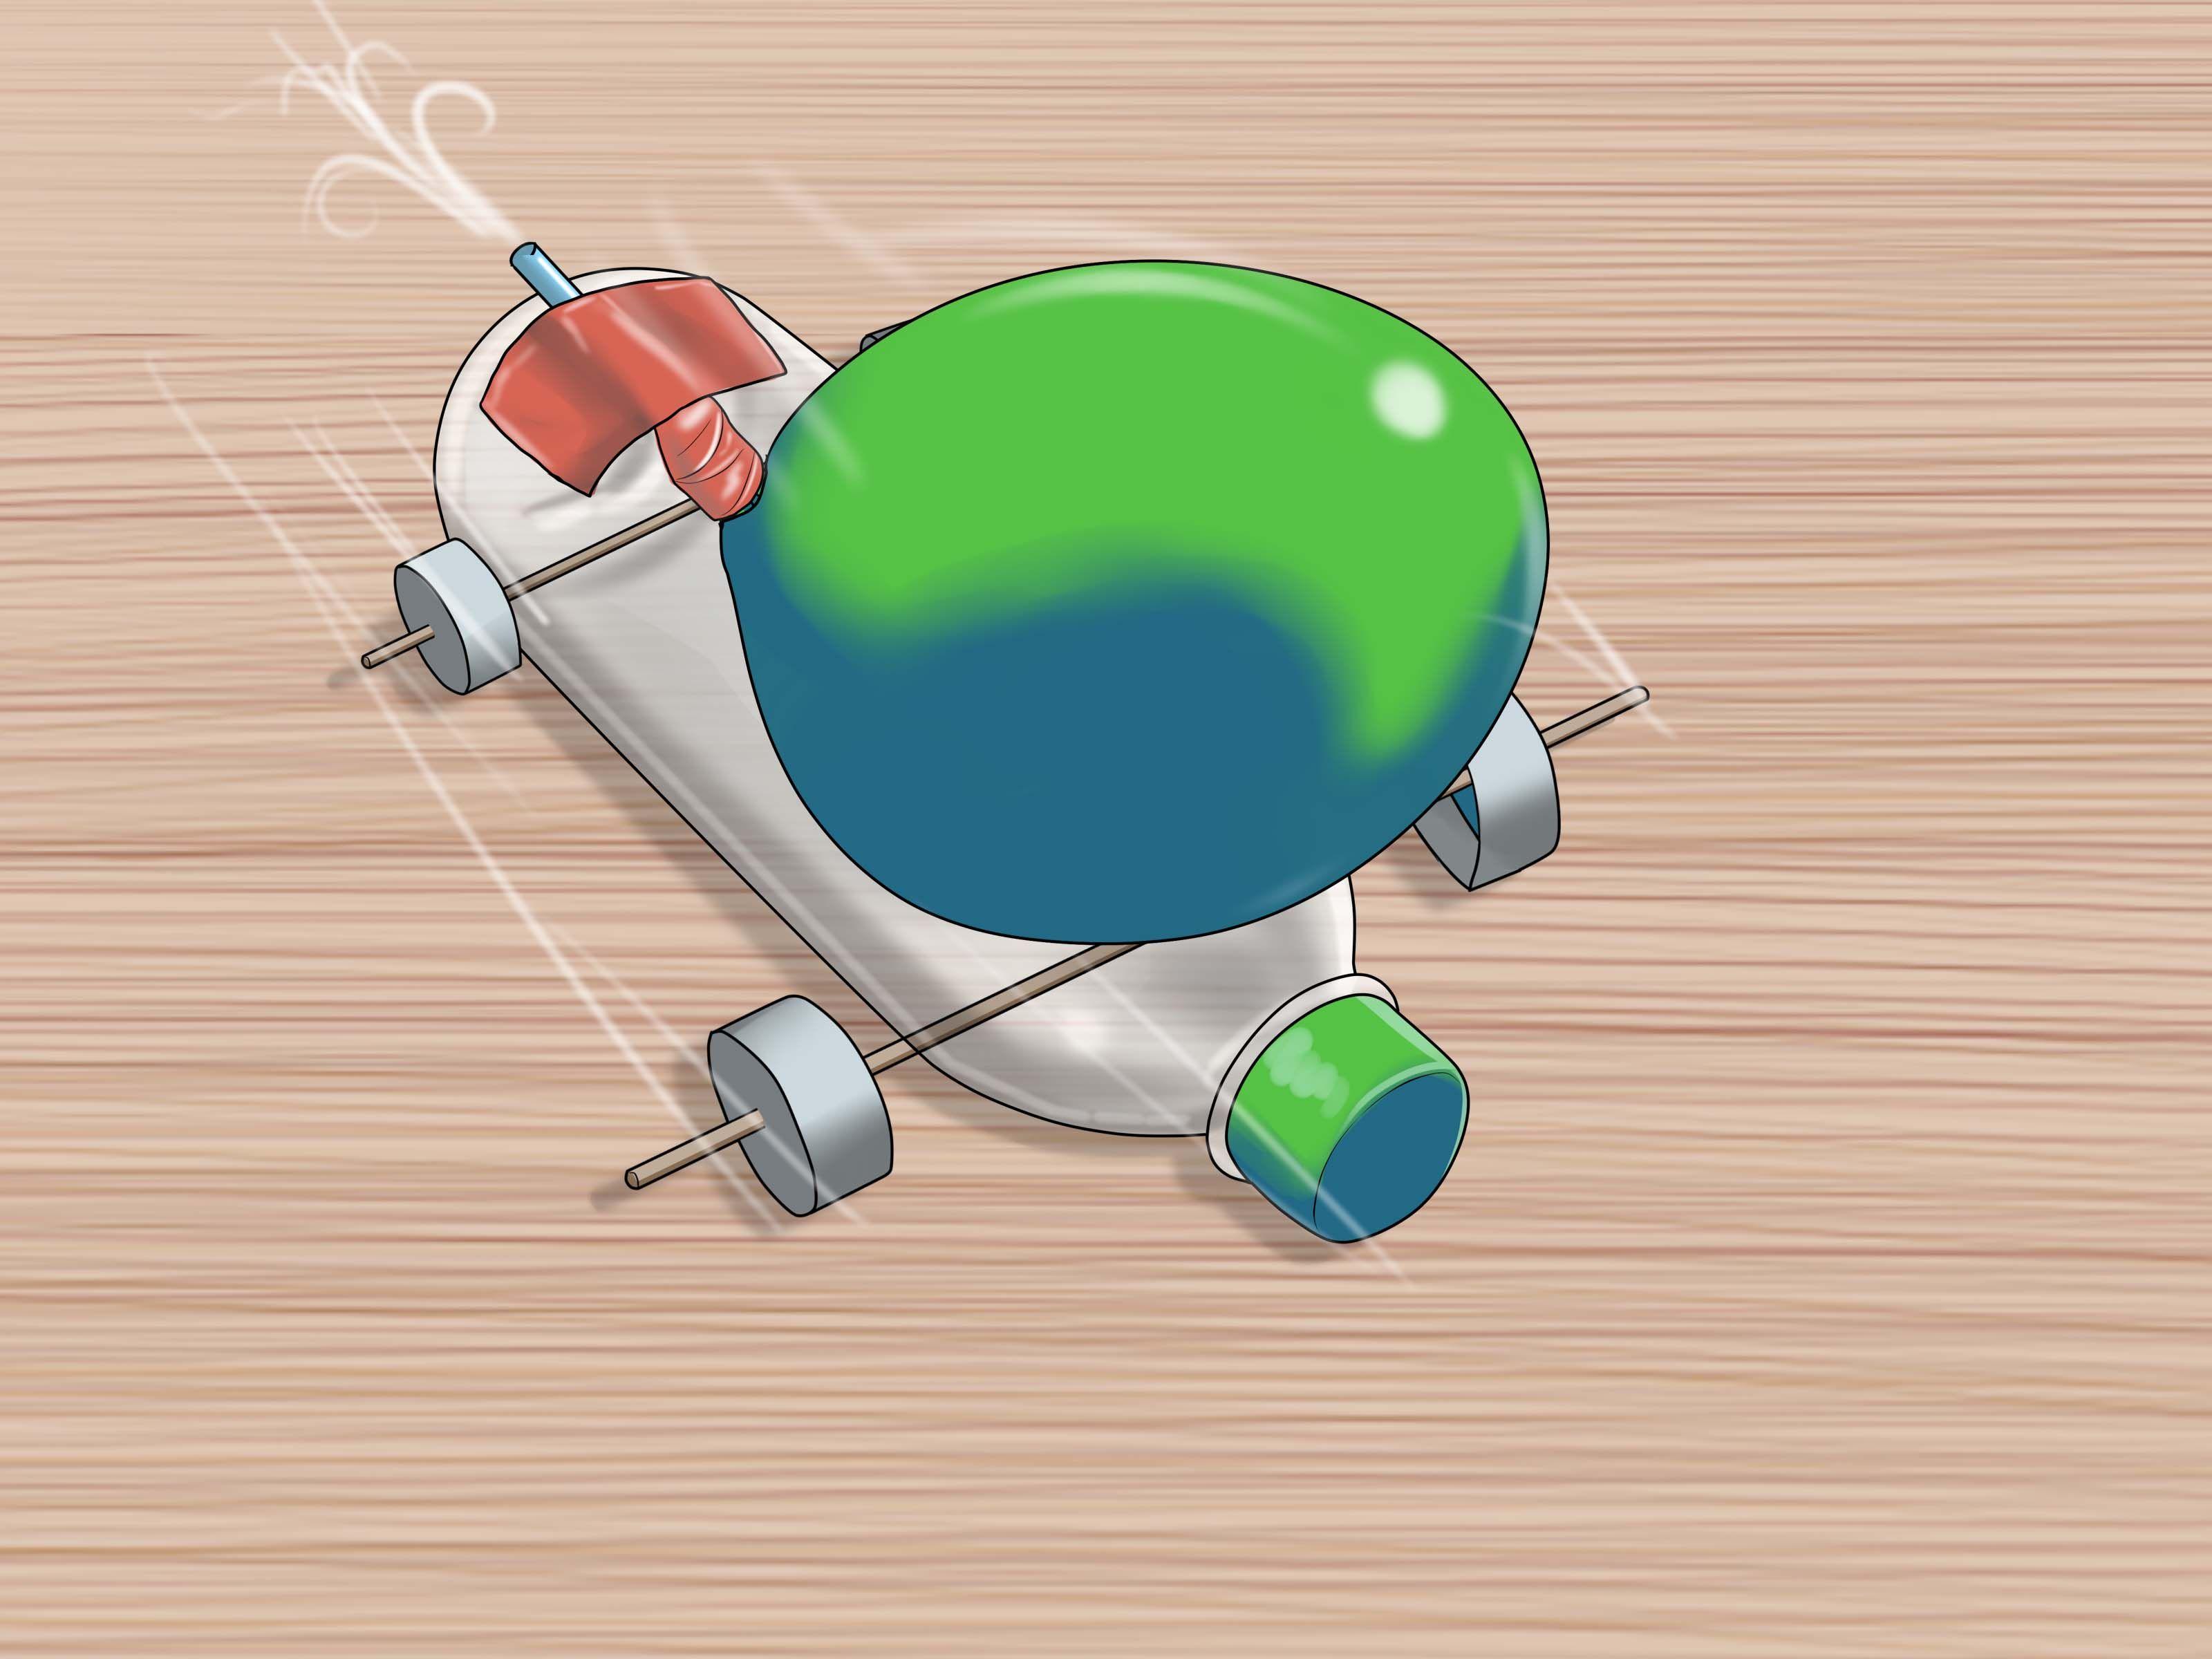 Design of bottle car jack - Make A Balloon Car